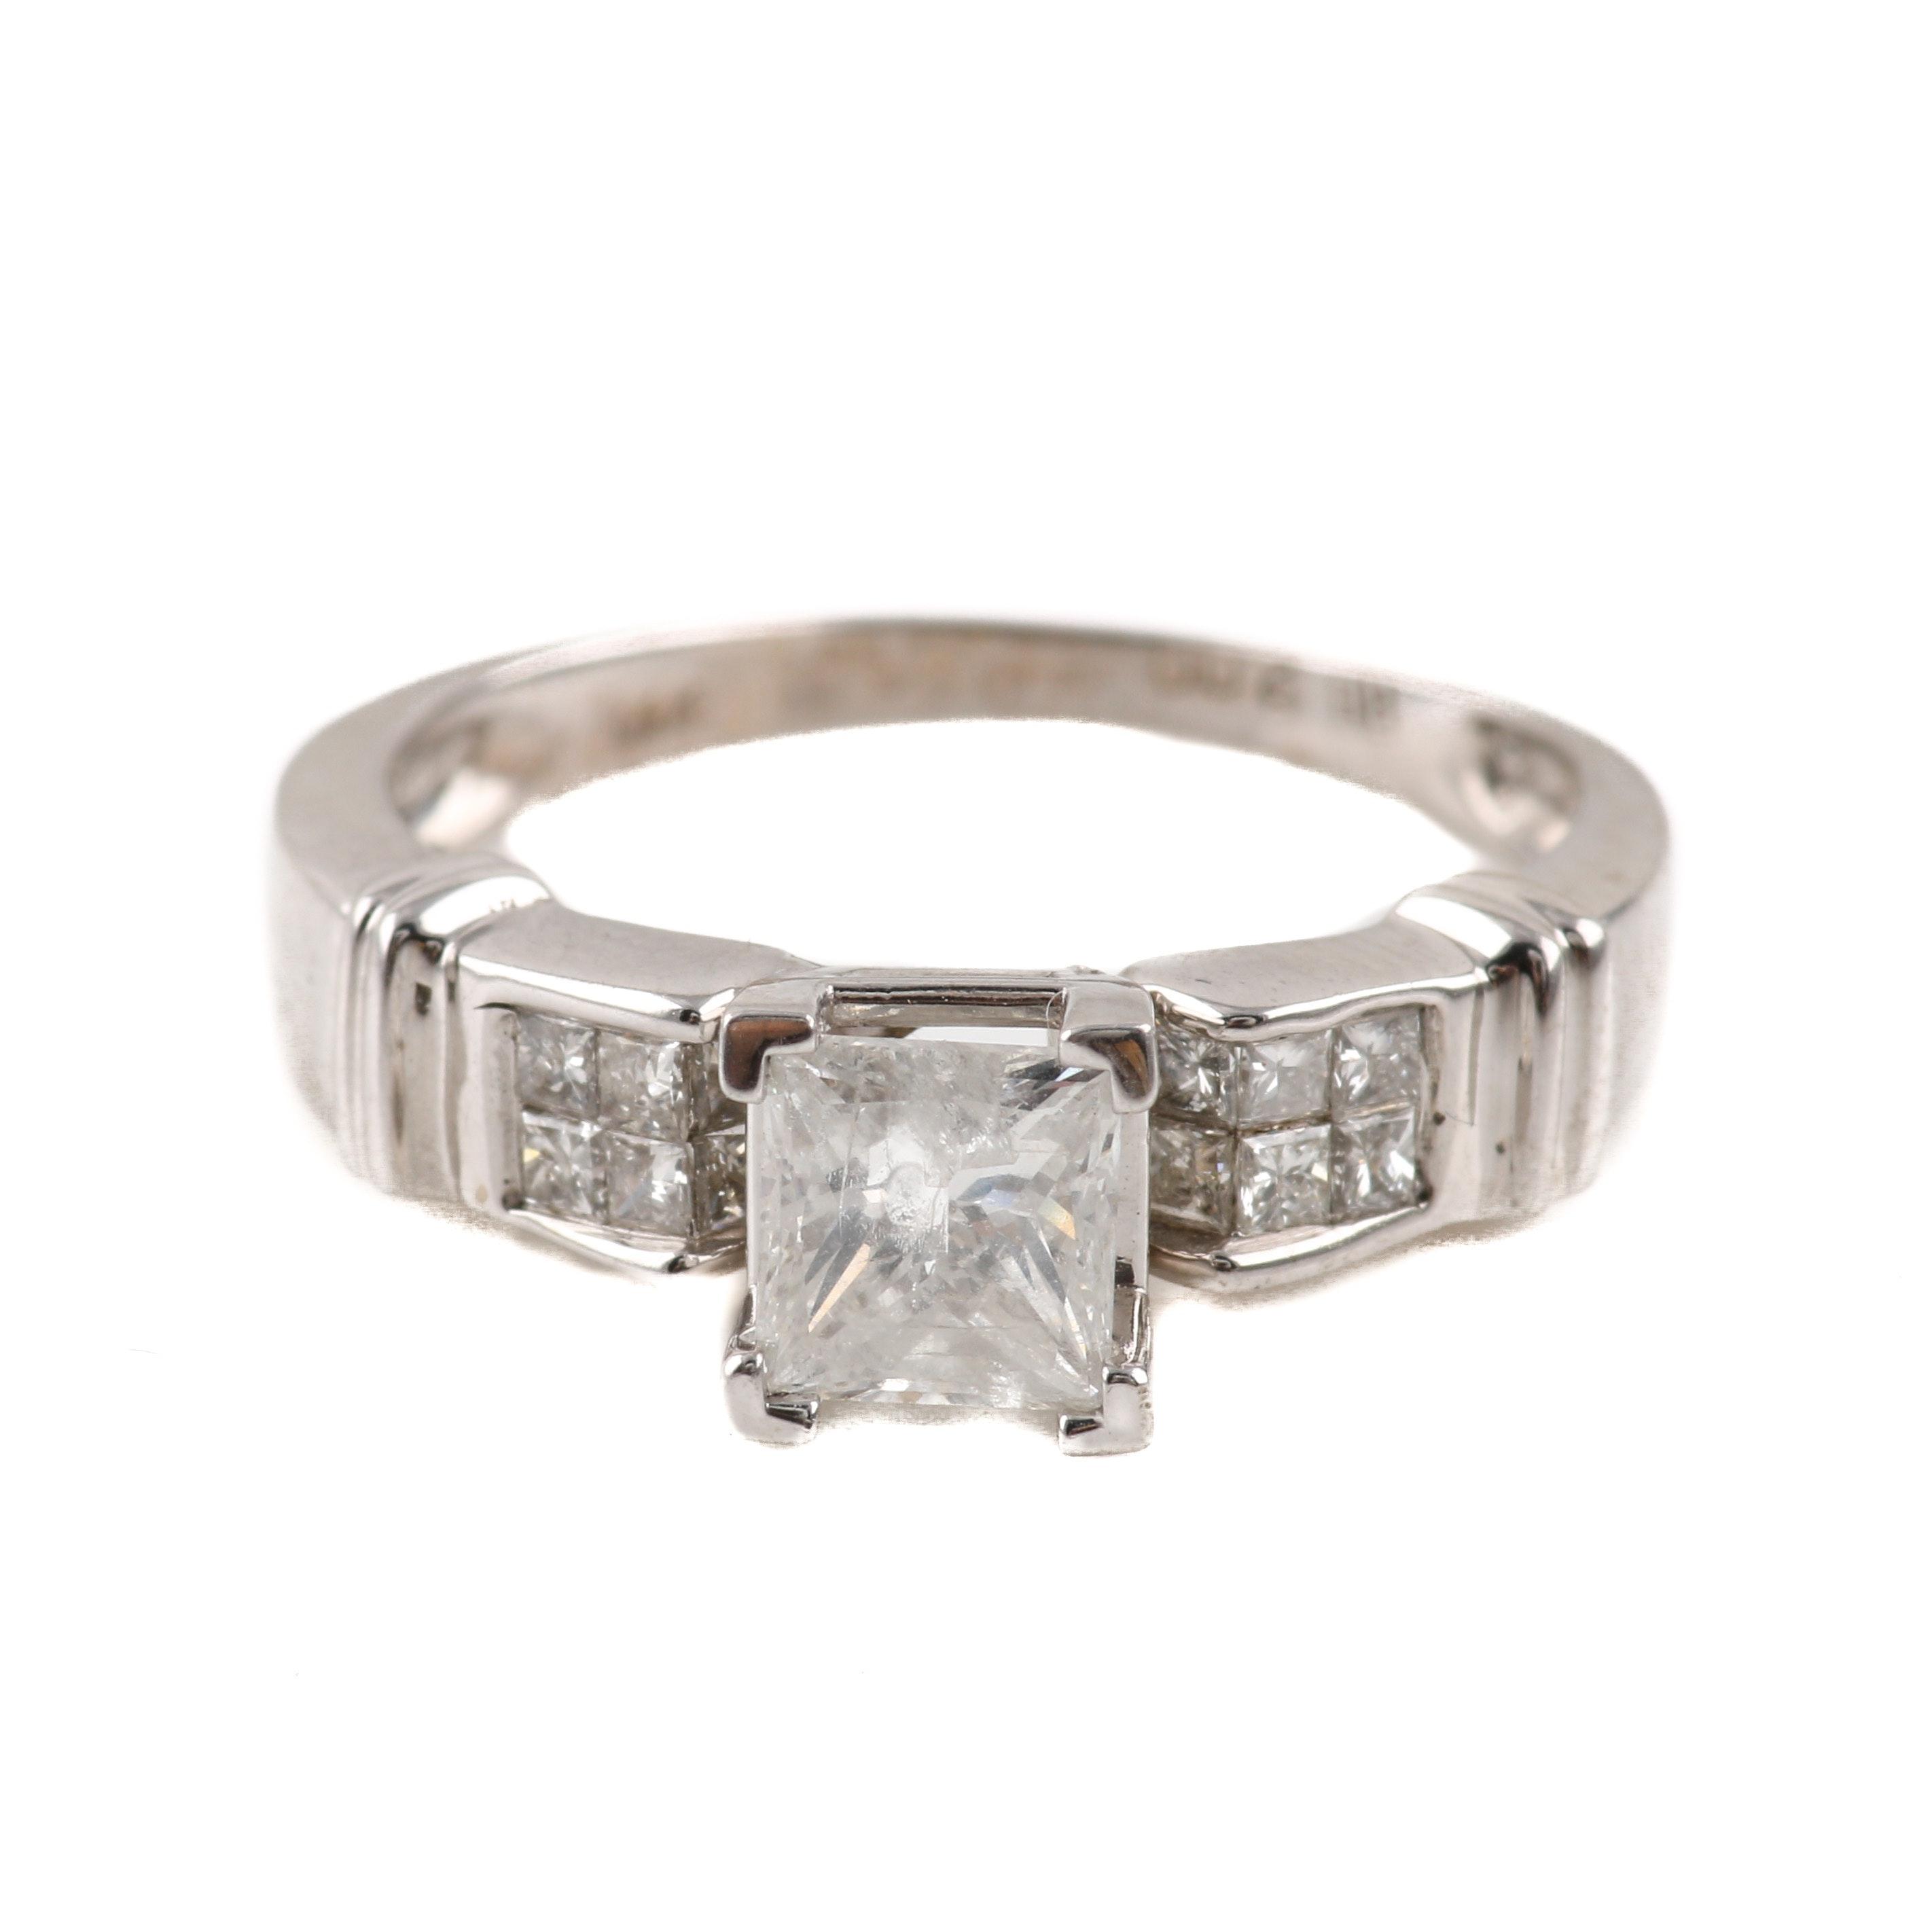 14K White Gold 1.26 CTW Diamond Ring